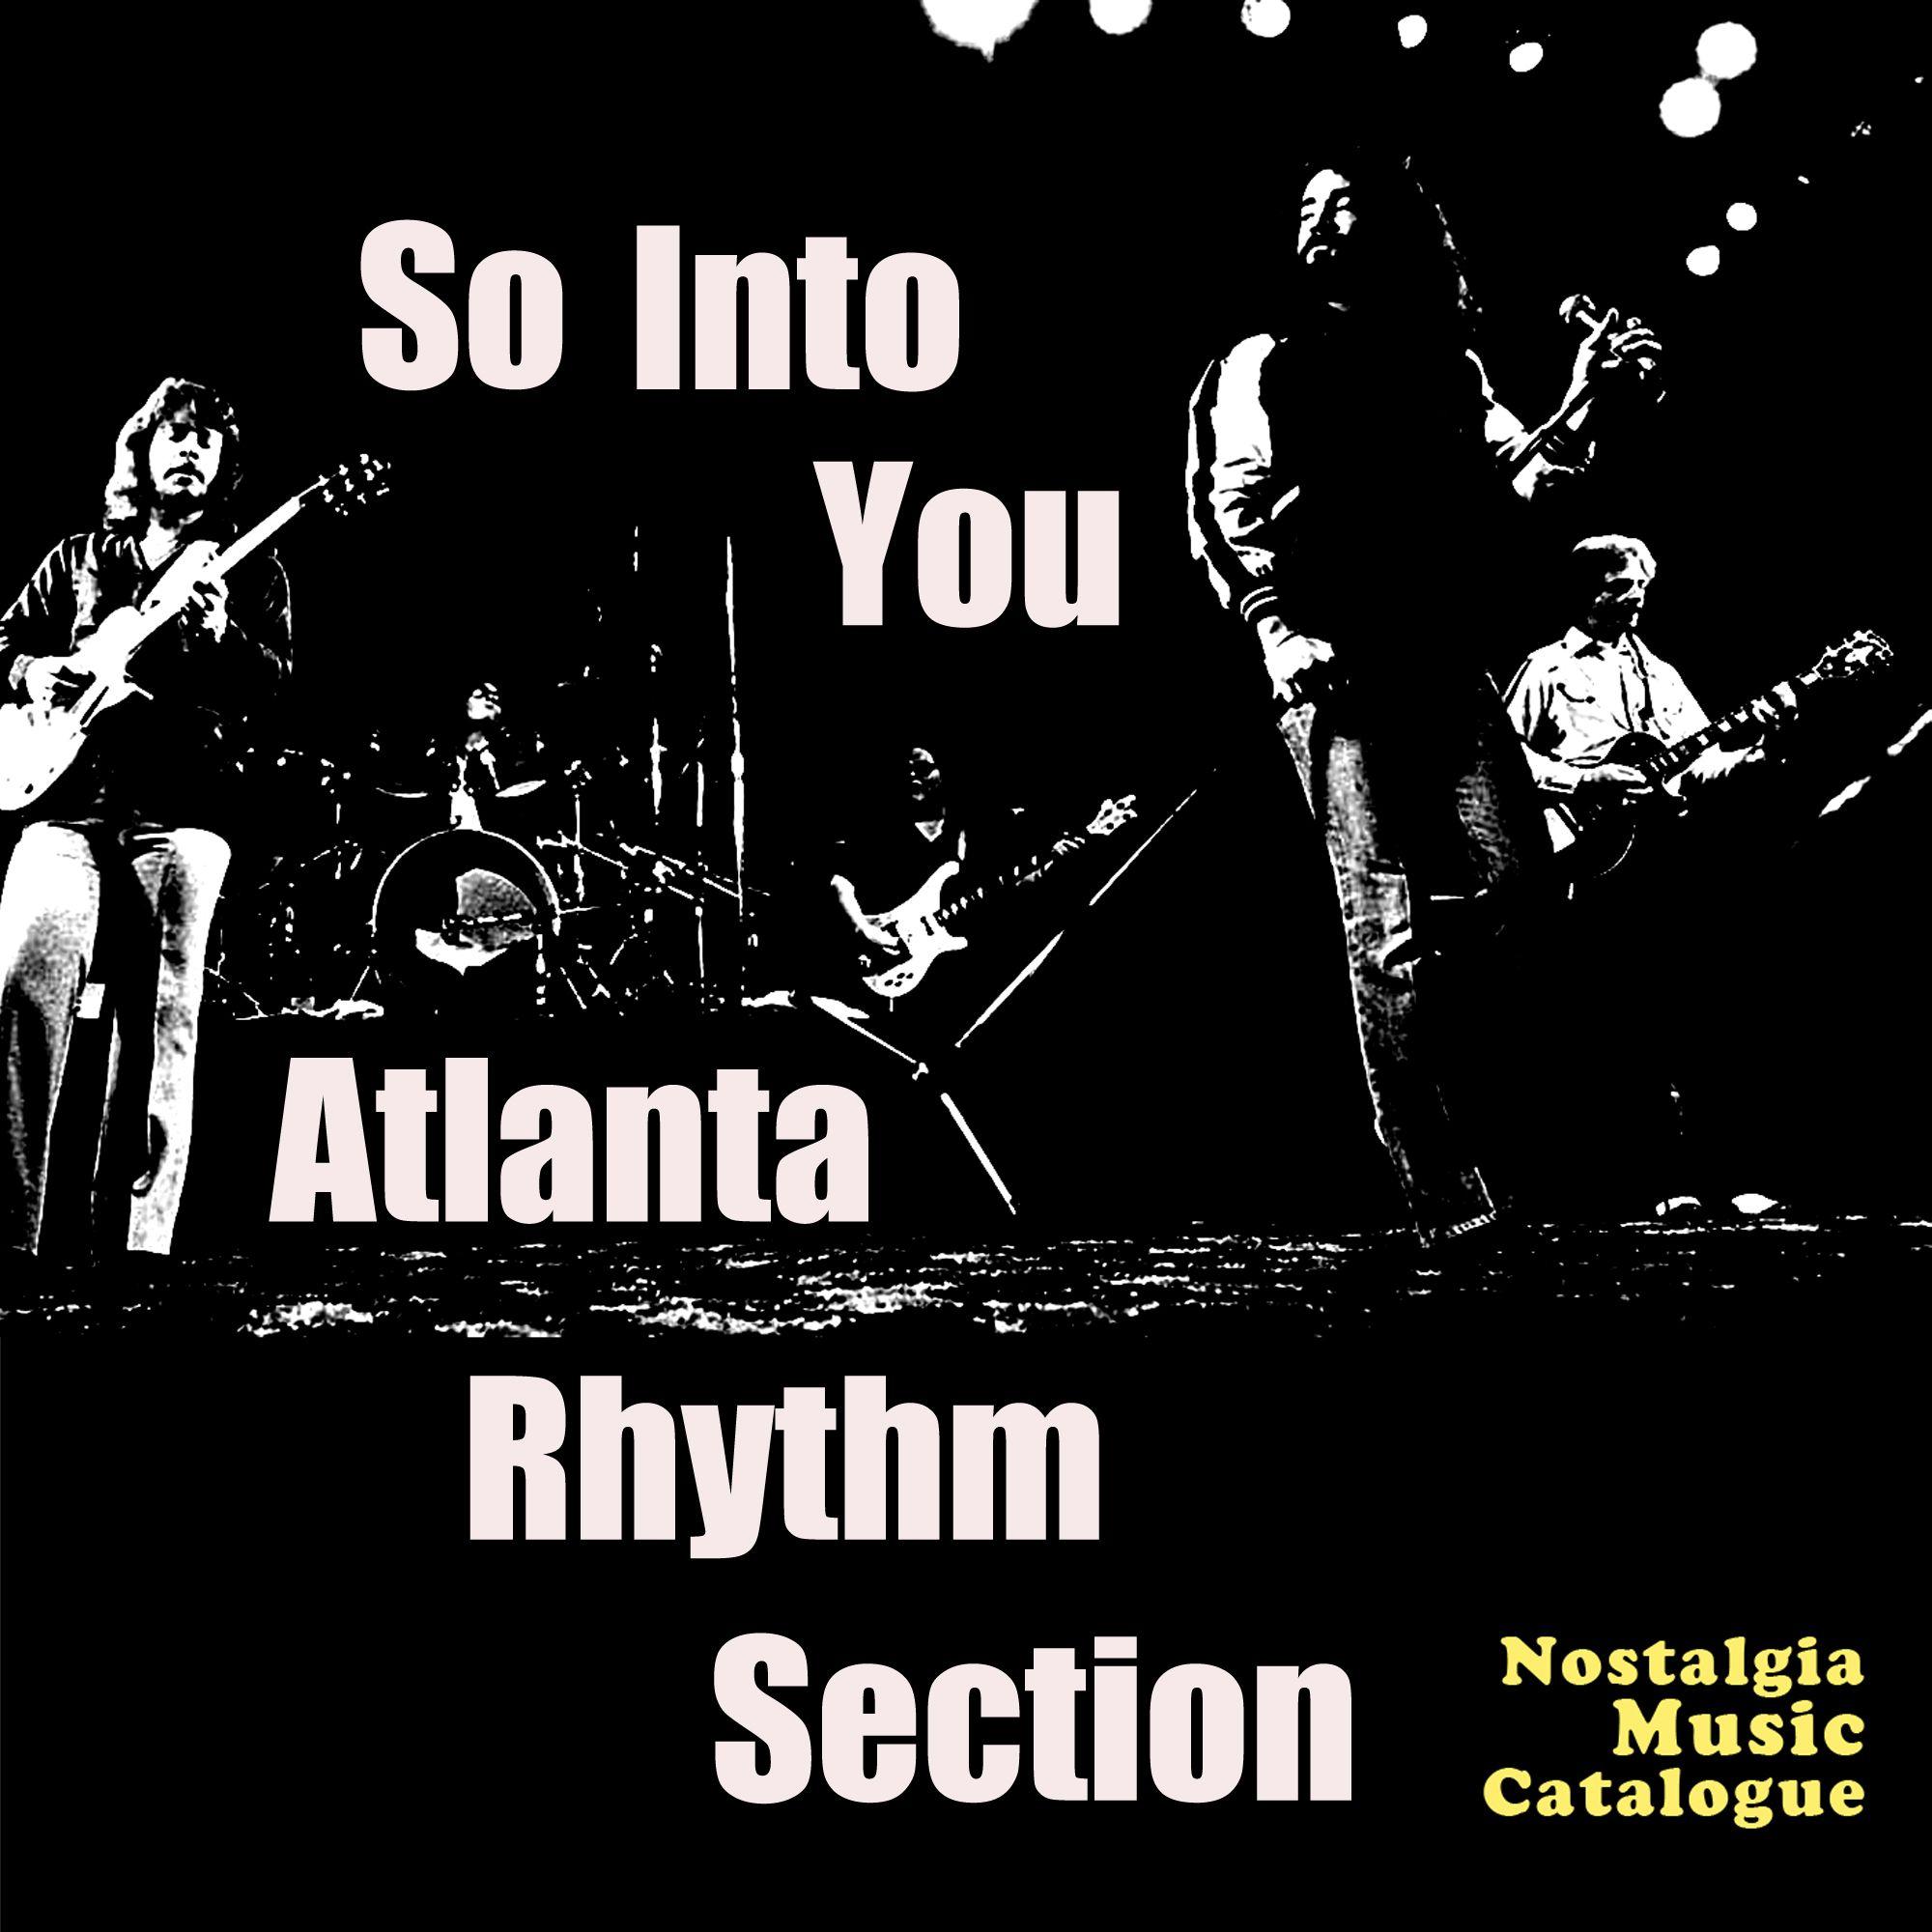 Atlanta Rhythm Section Dont Miss The Messagewmv